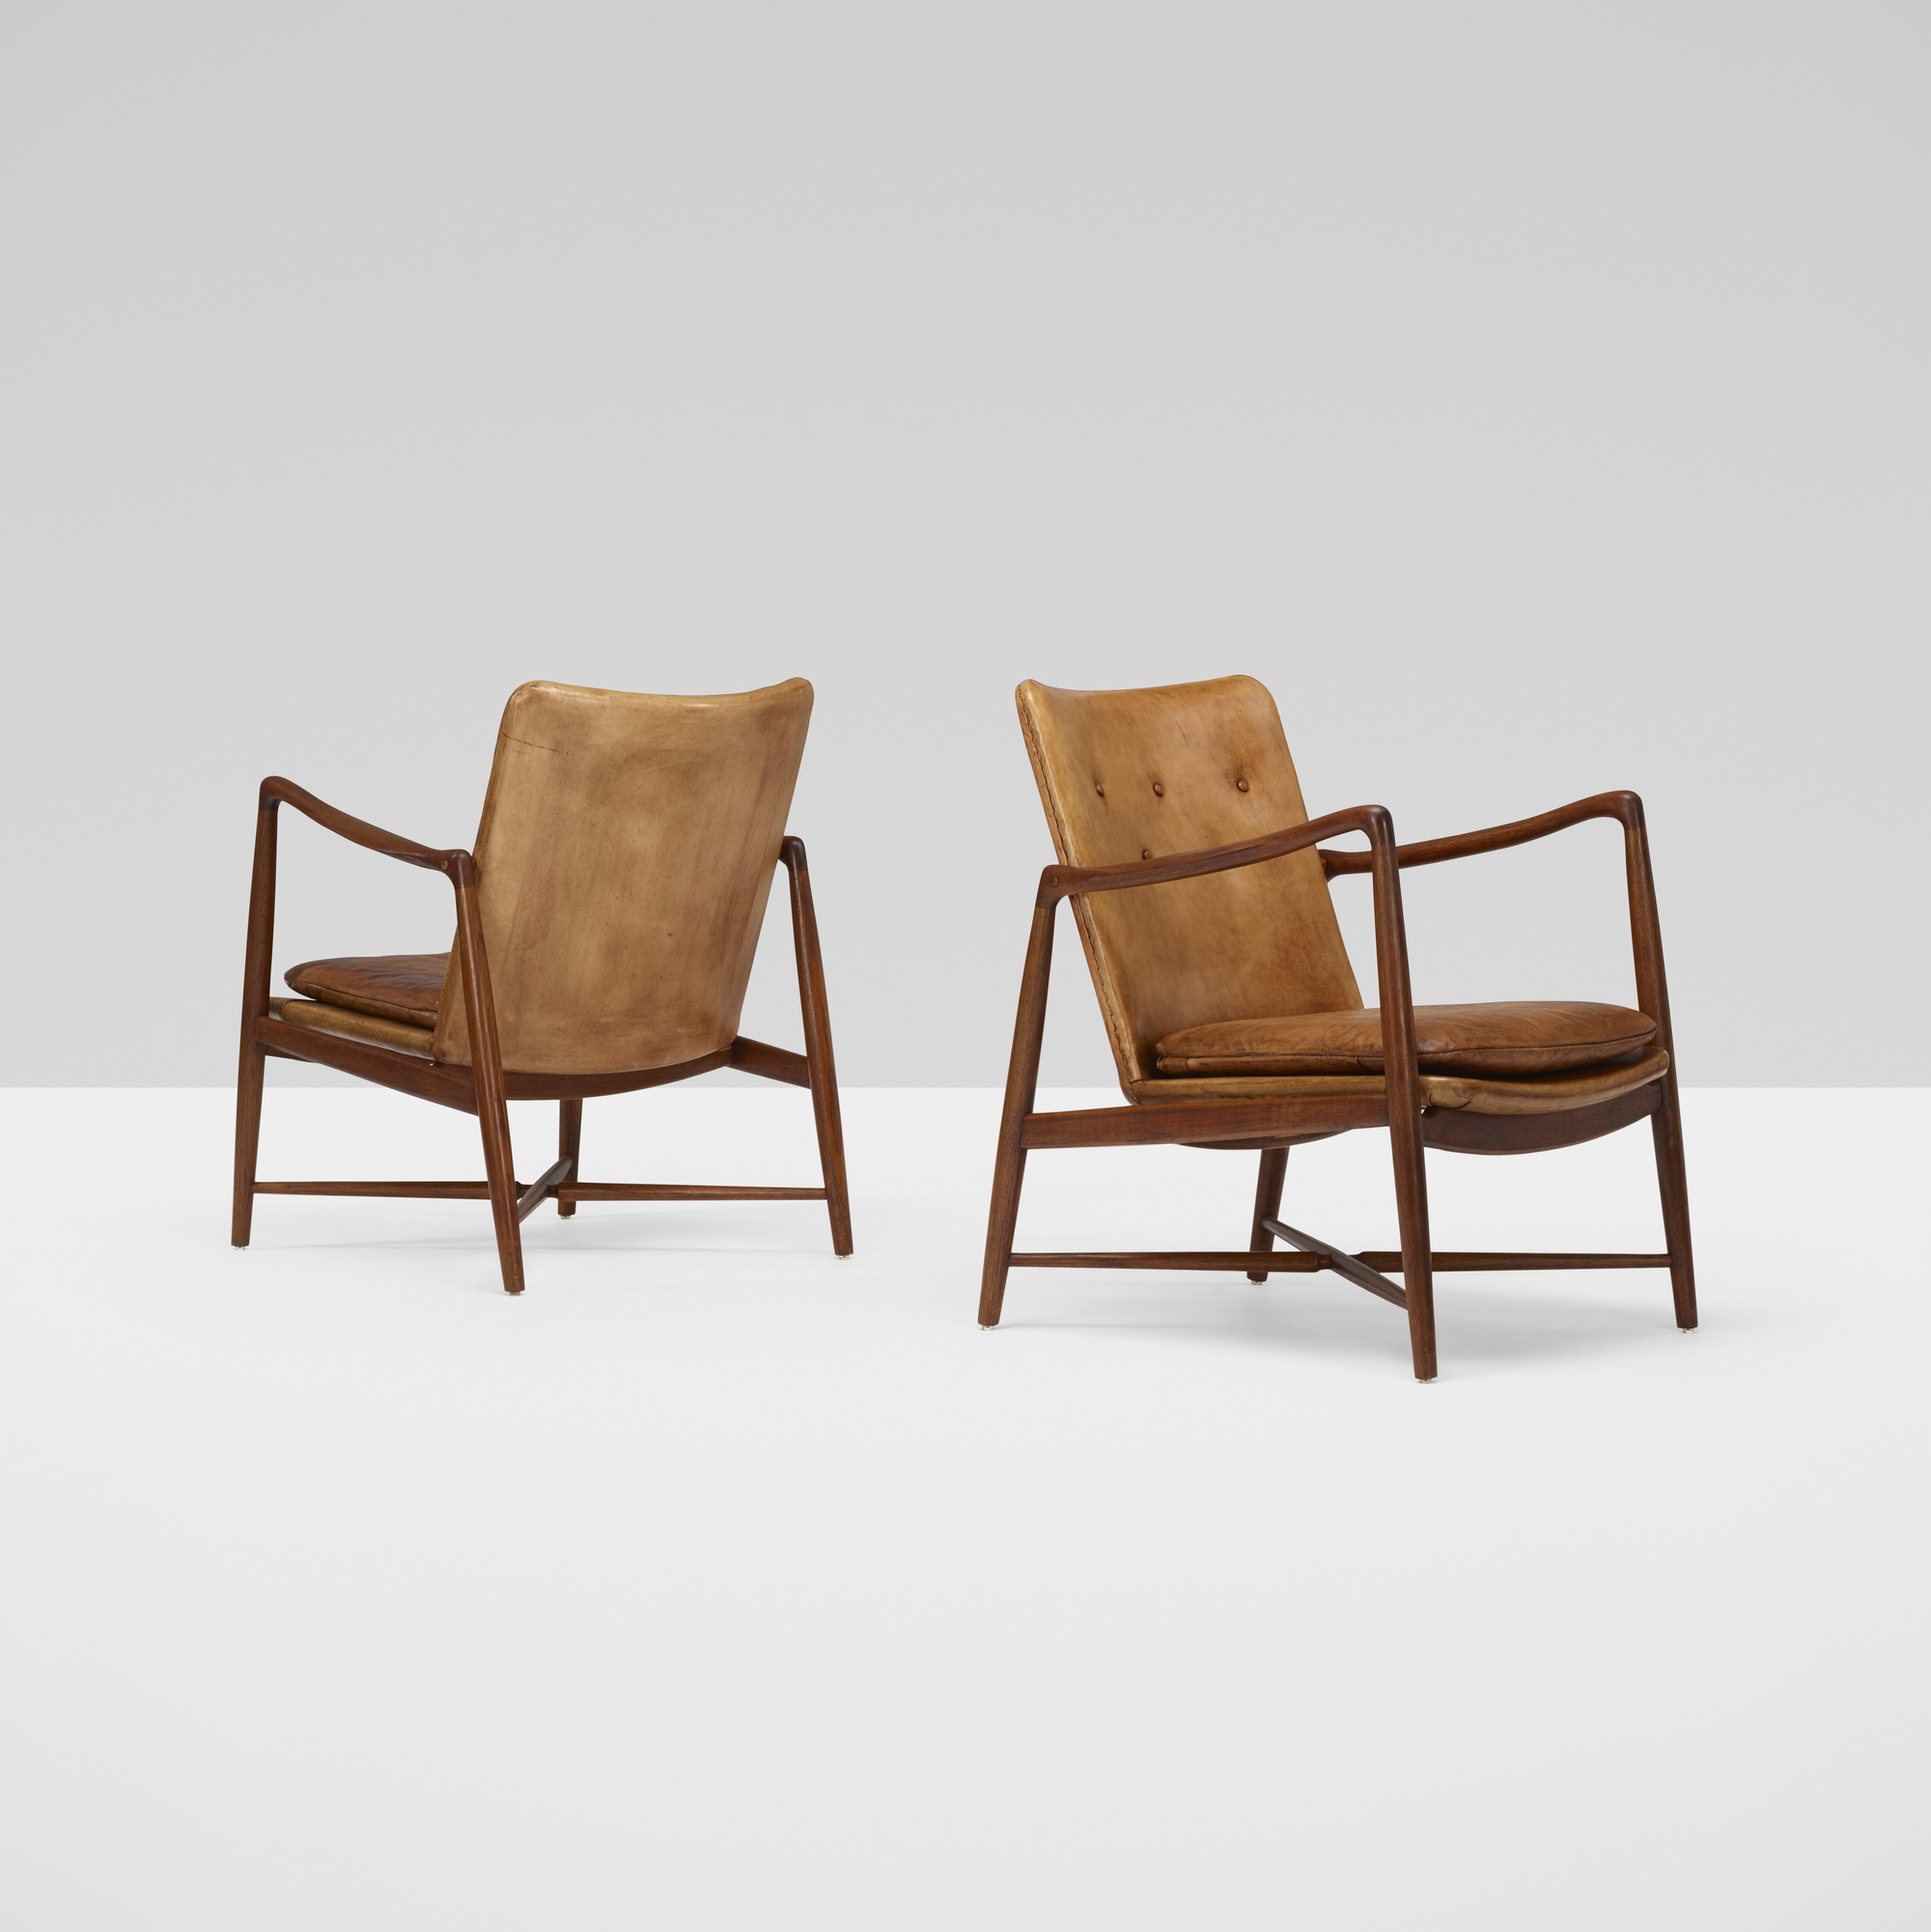 377: Finn Juhl / armchairs, pair (2 of 5)